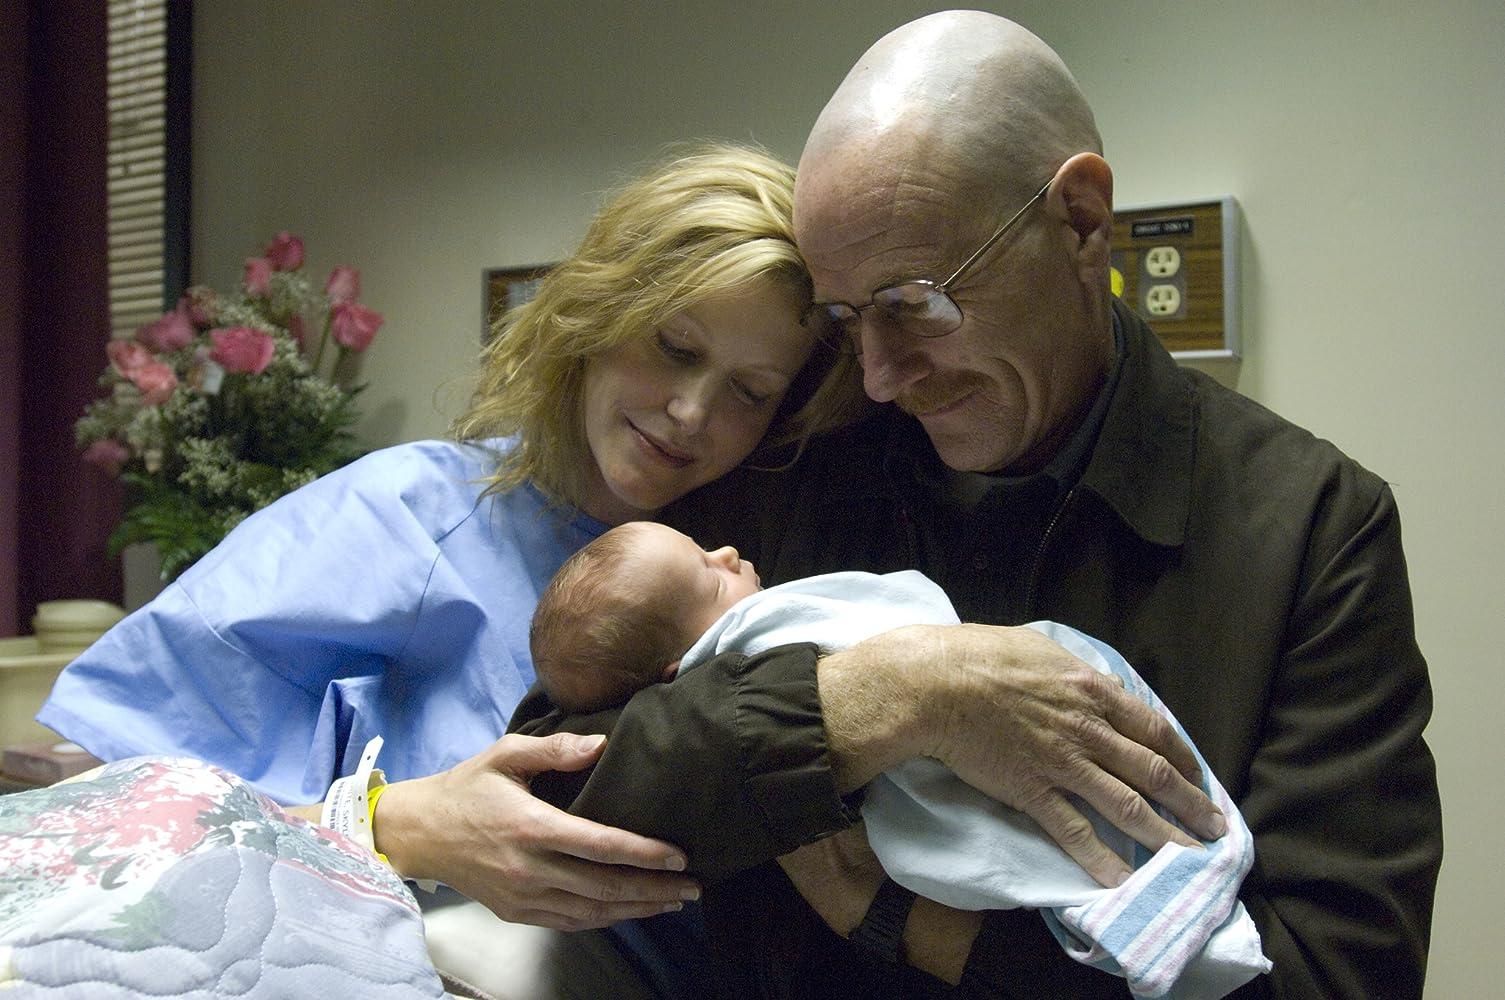 Bryan Cranston and Anna Gunn in Breaking Bad (2008)